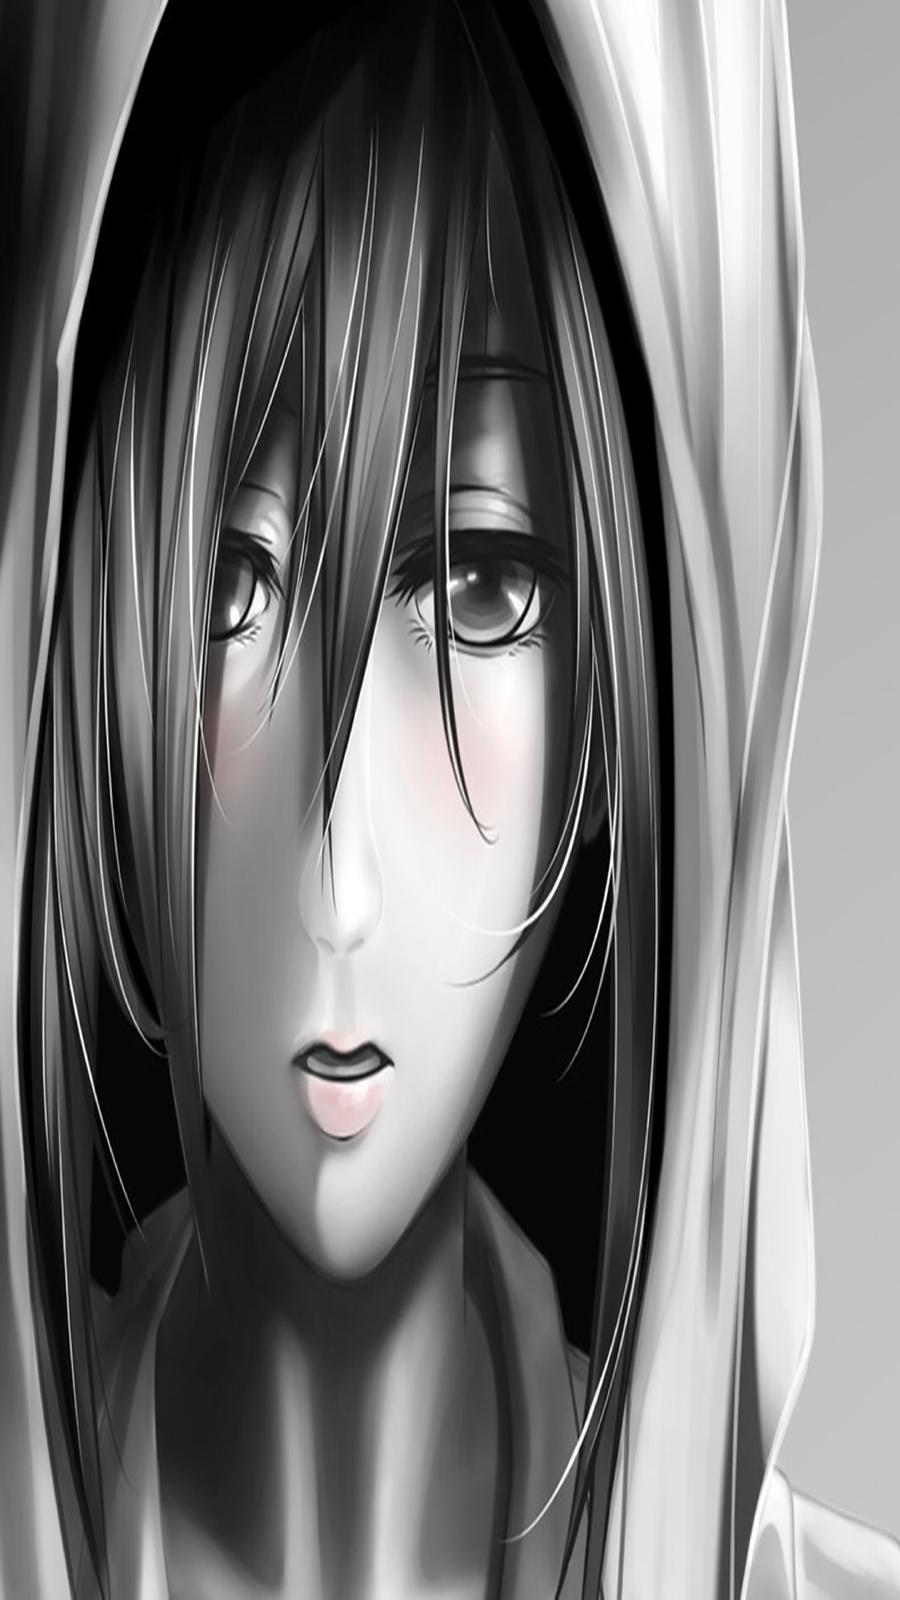 Anime Girl Face Wallpapers